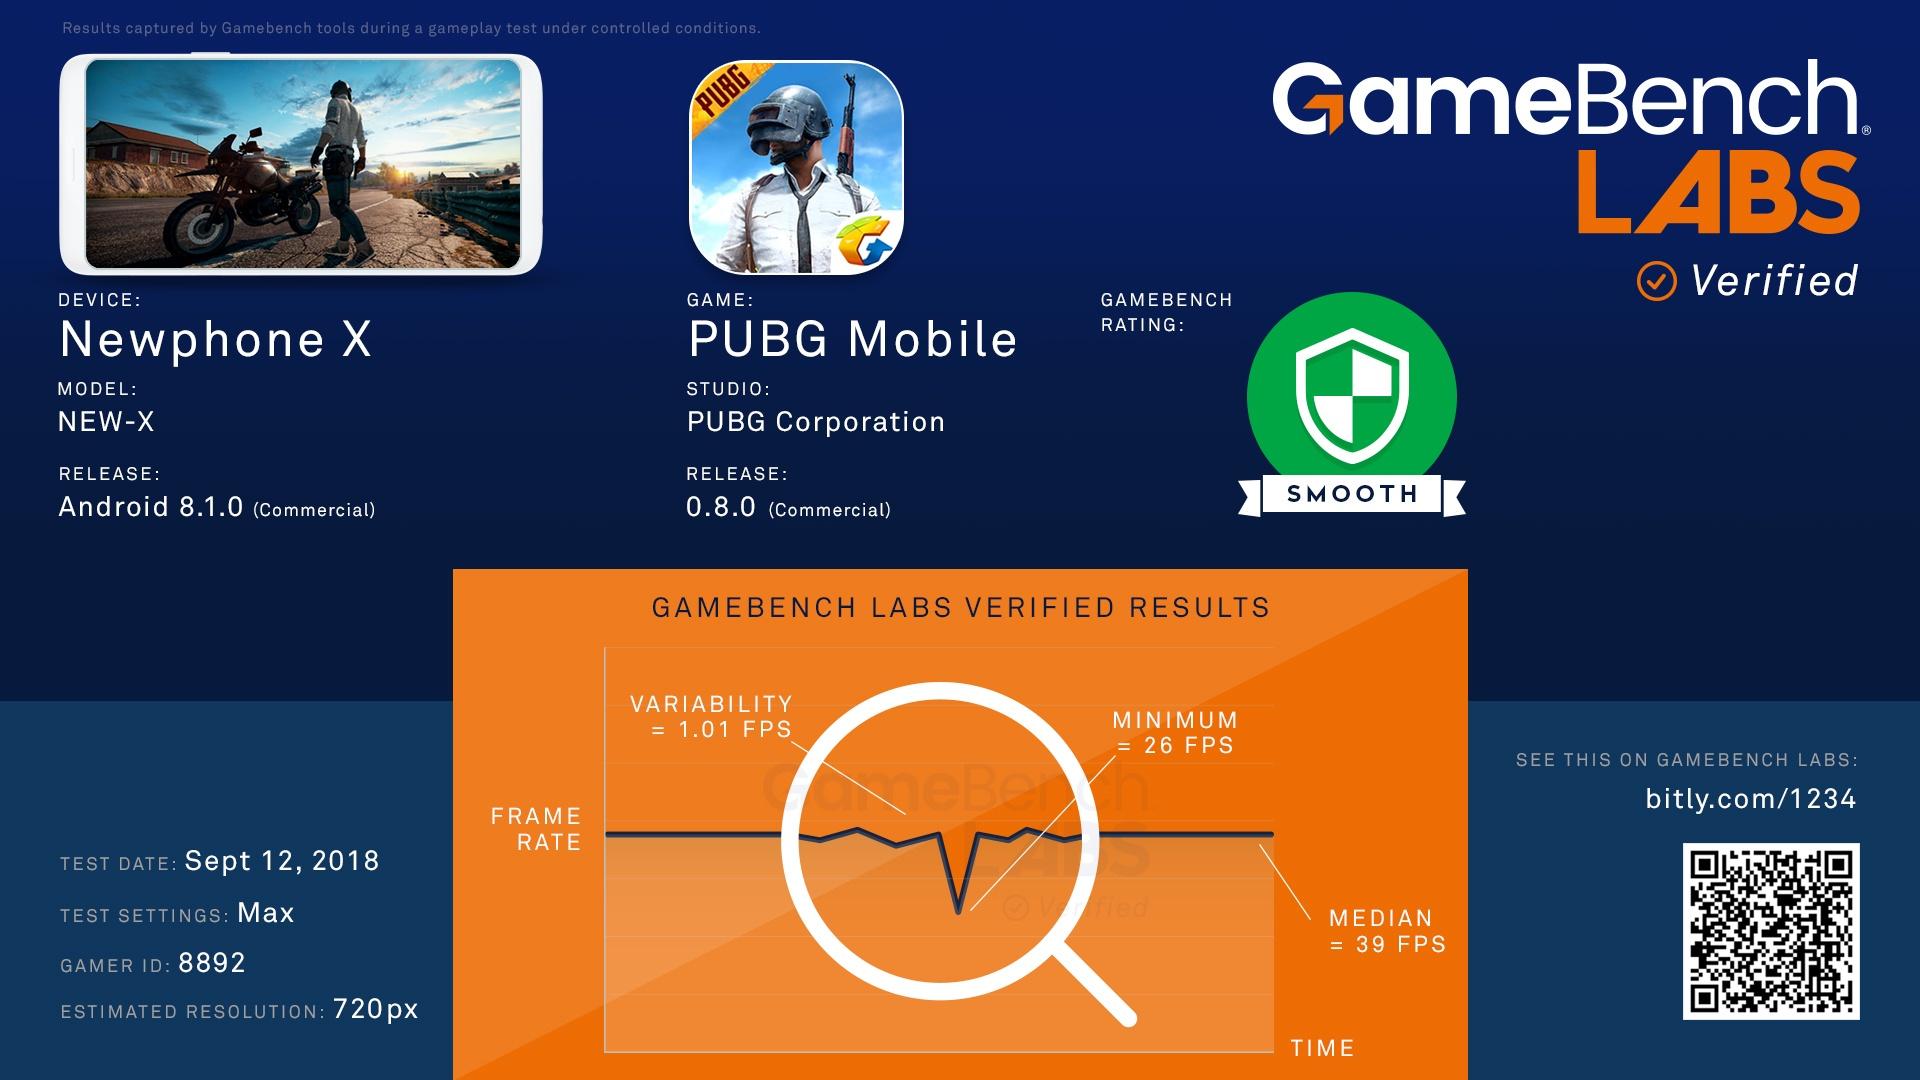 2385-Gamebench-ResultsCard-Card2-05